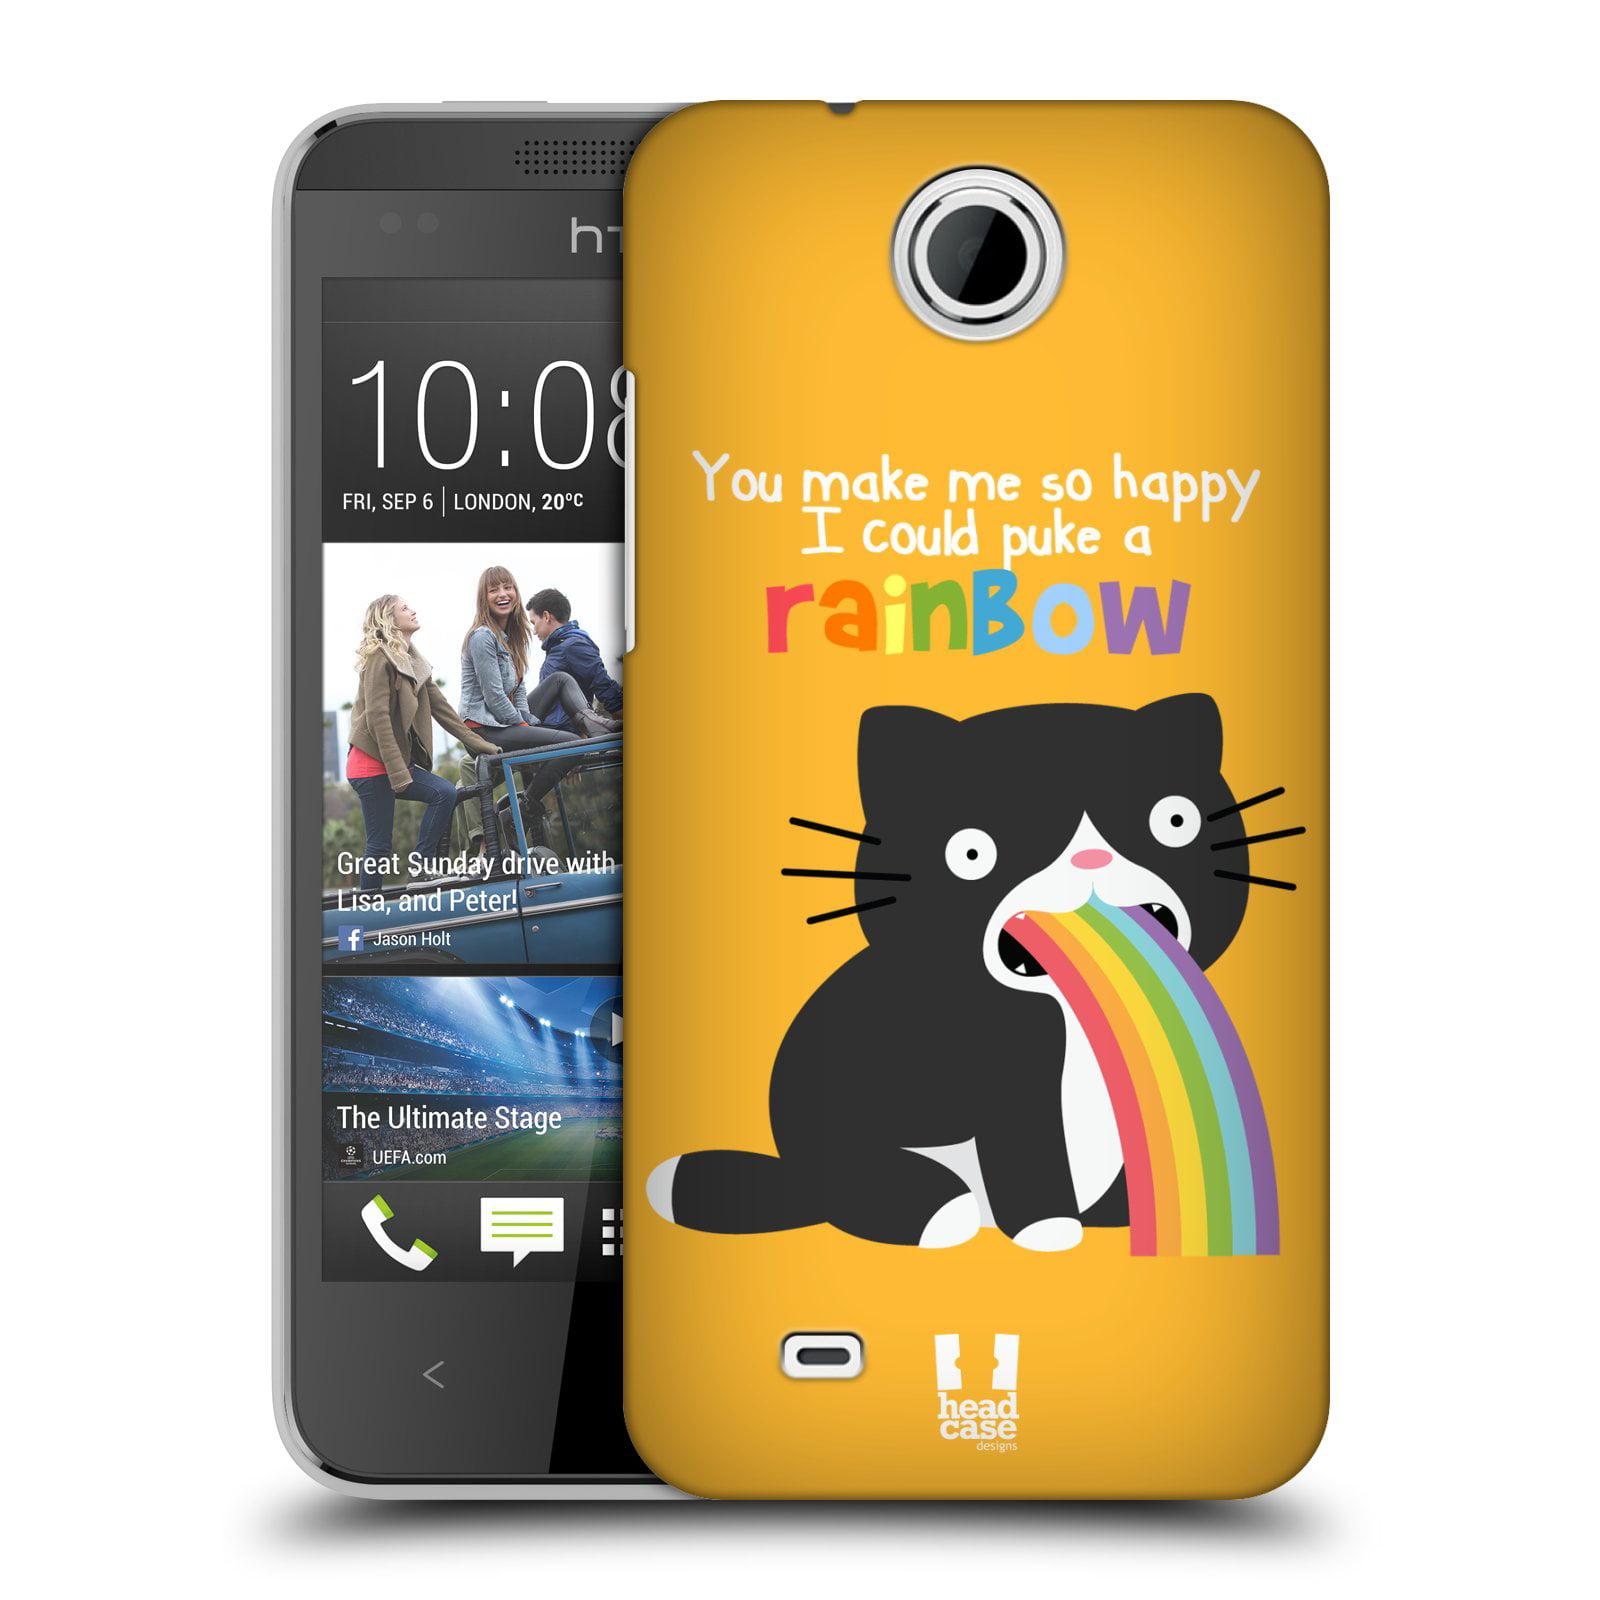 HEAD CASE DESIGNS RAINBOW PUKE HARD BACK CASE FOR HTC PHONES 3